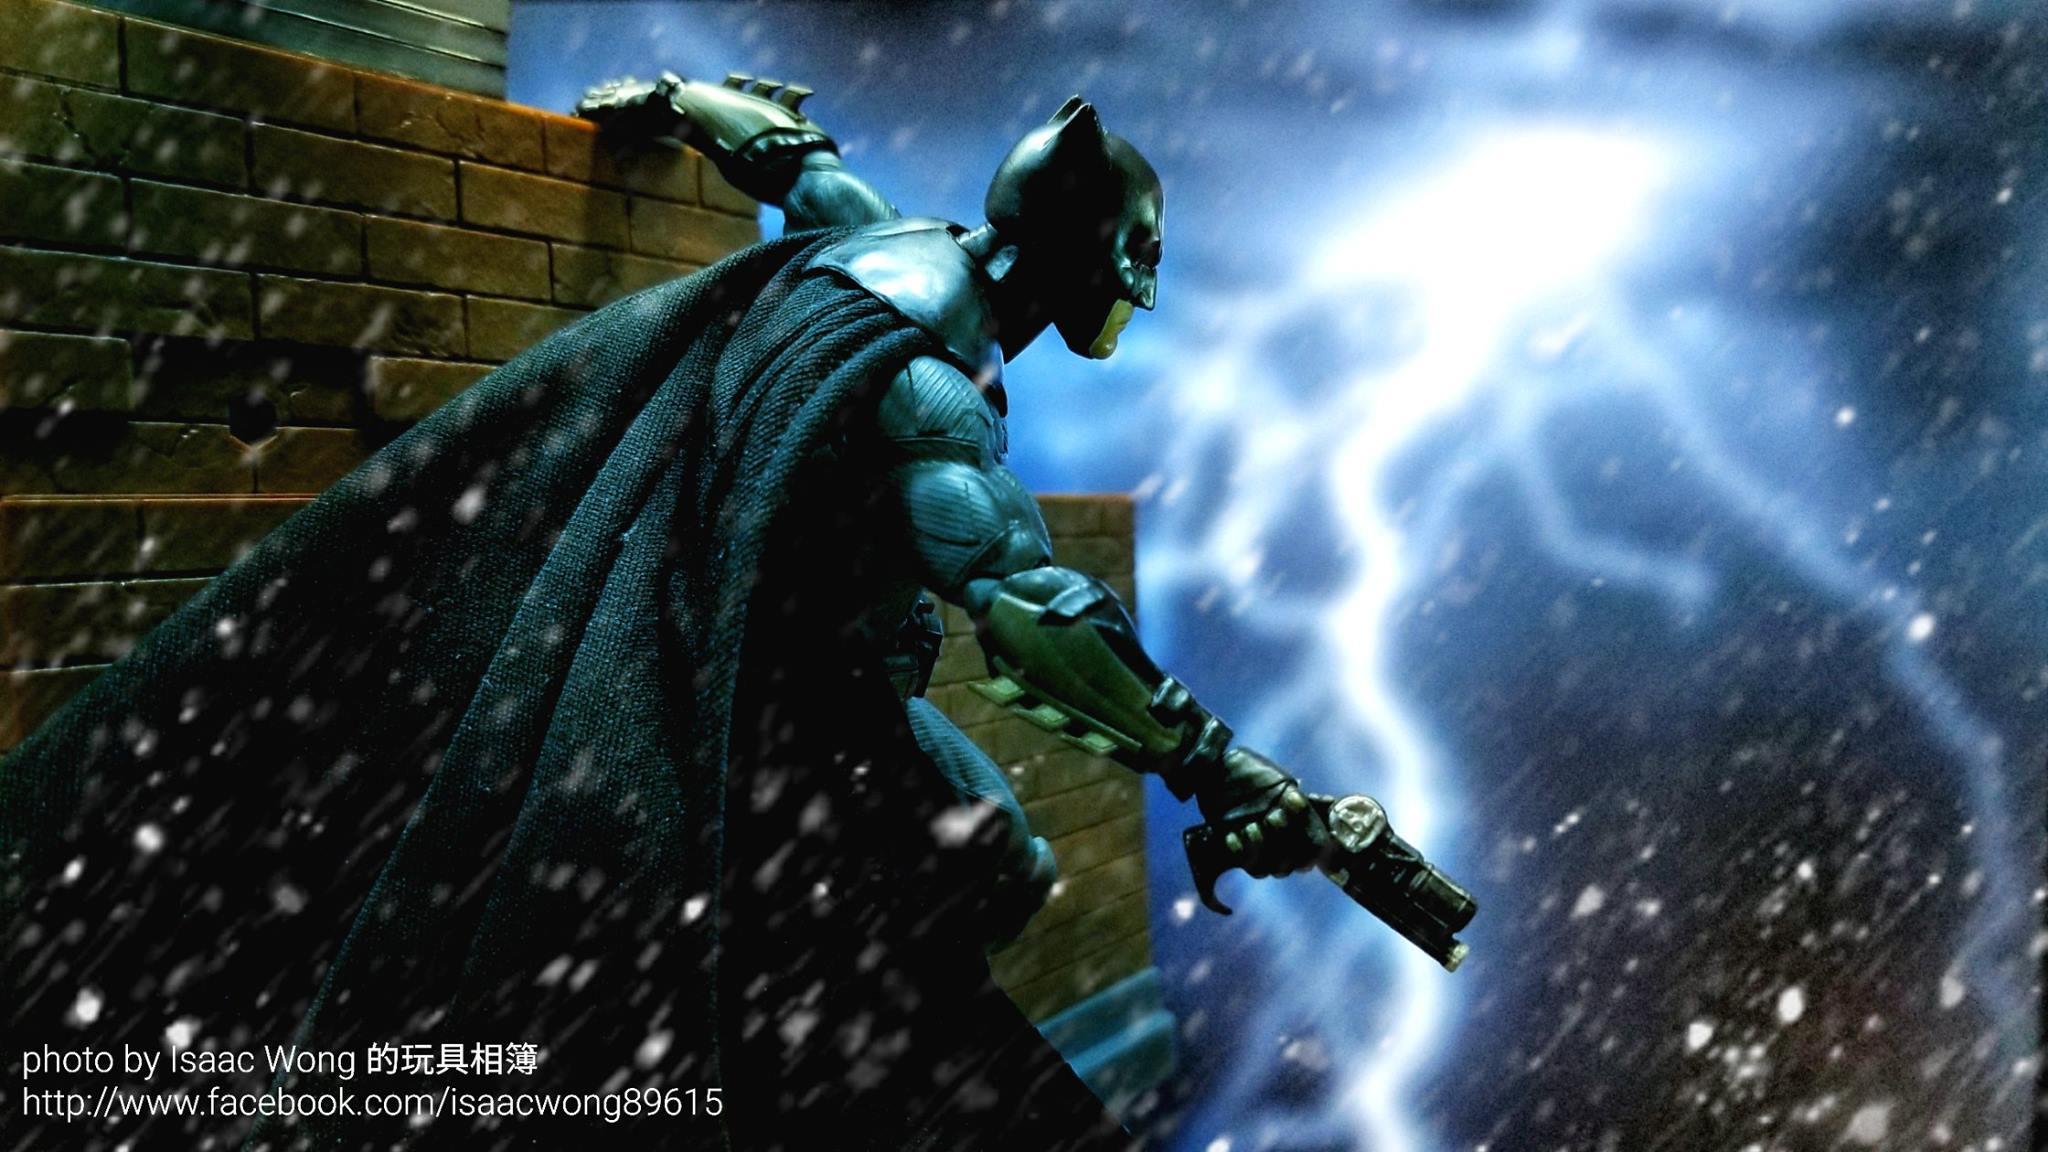 [Comentários] DC Comics S.H. Figuarts X3W0K0Yi_o